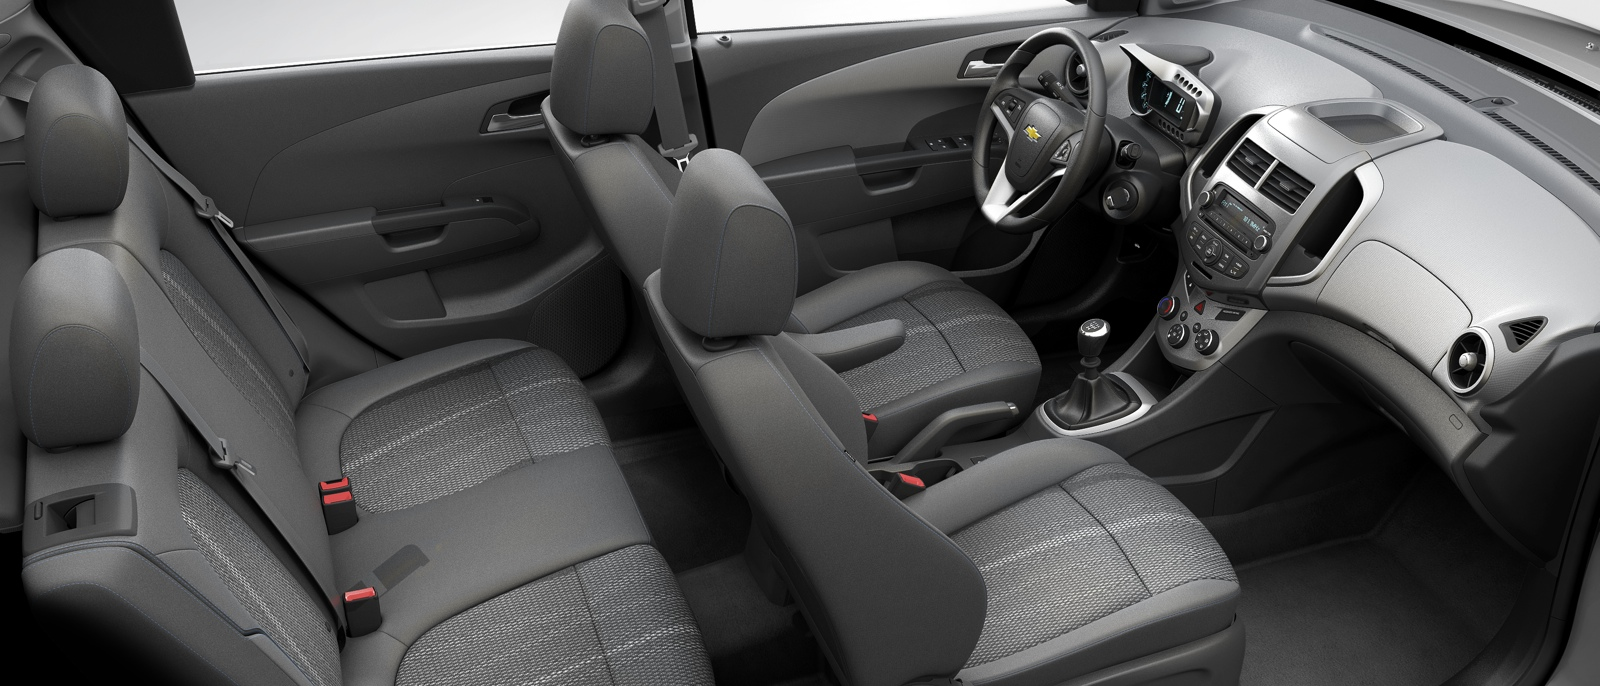 2015-Chevrolet-Sonic-2